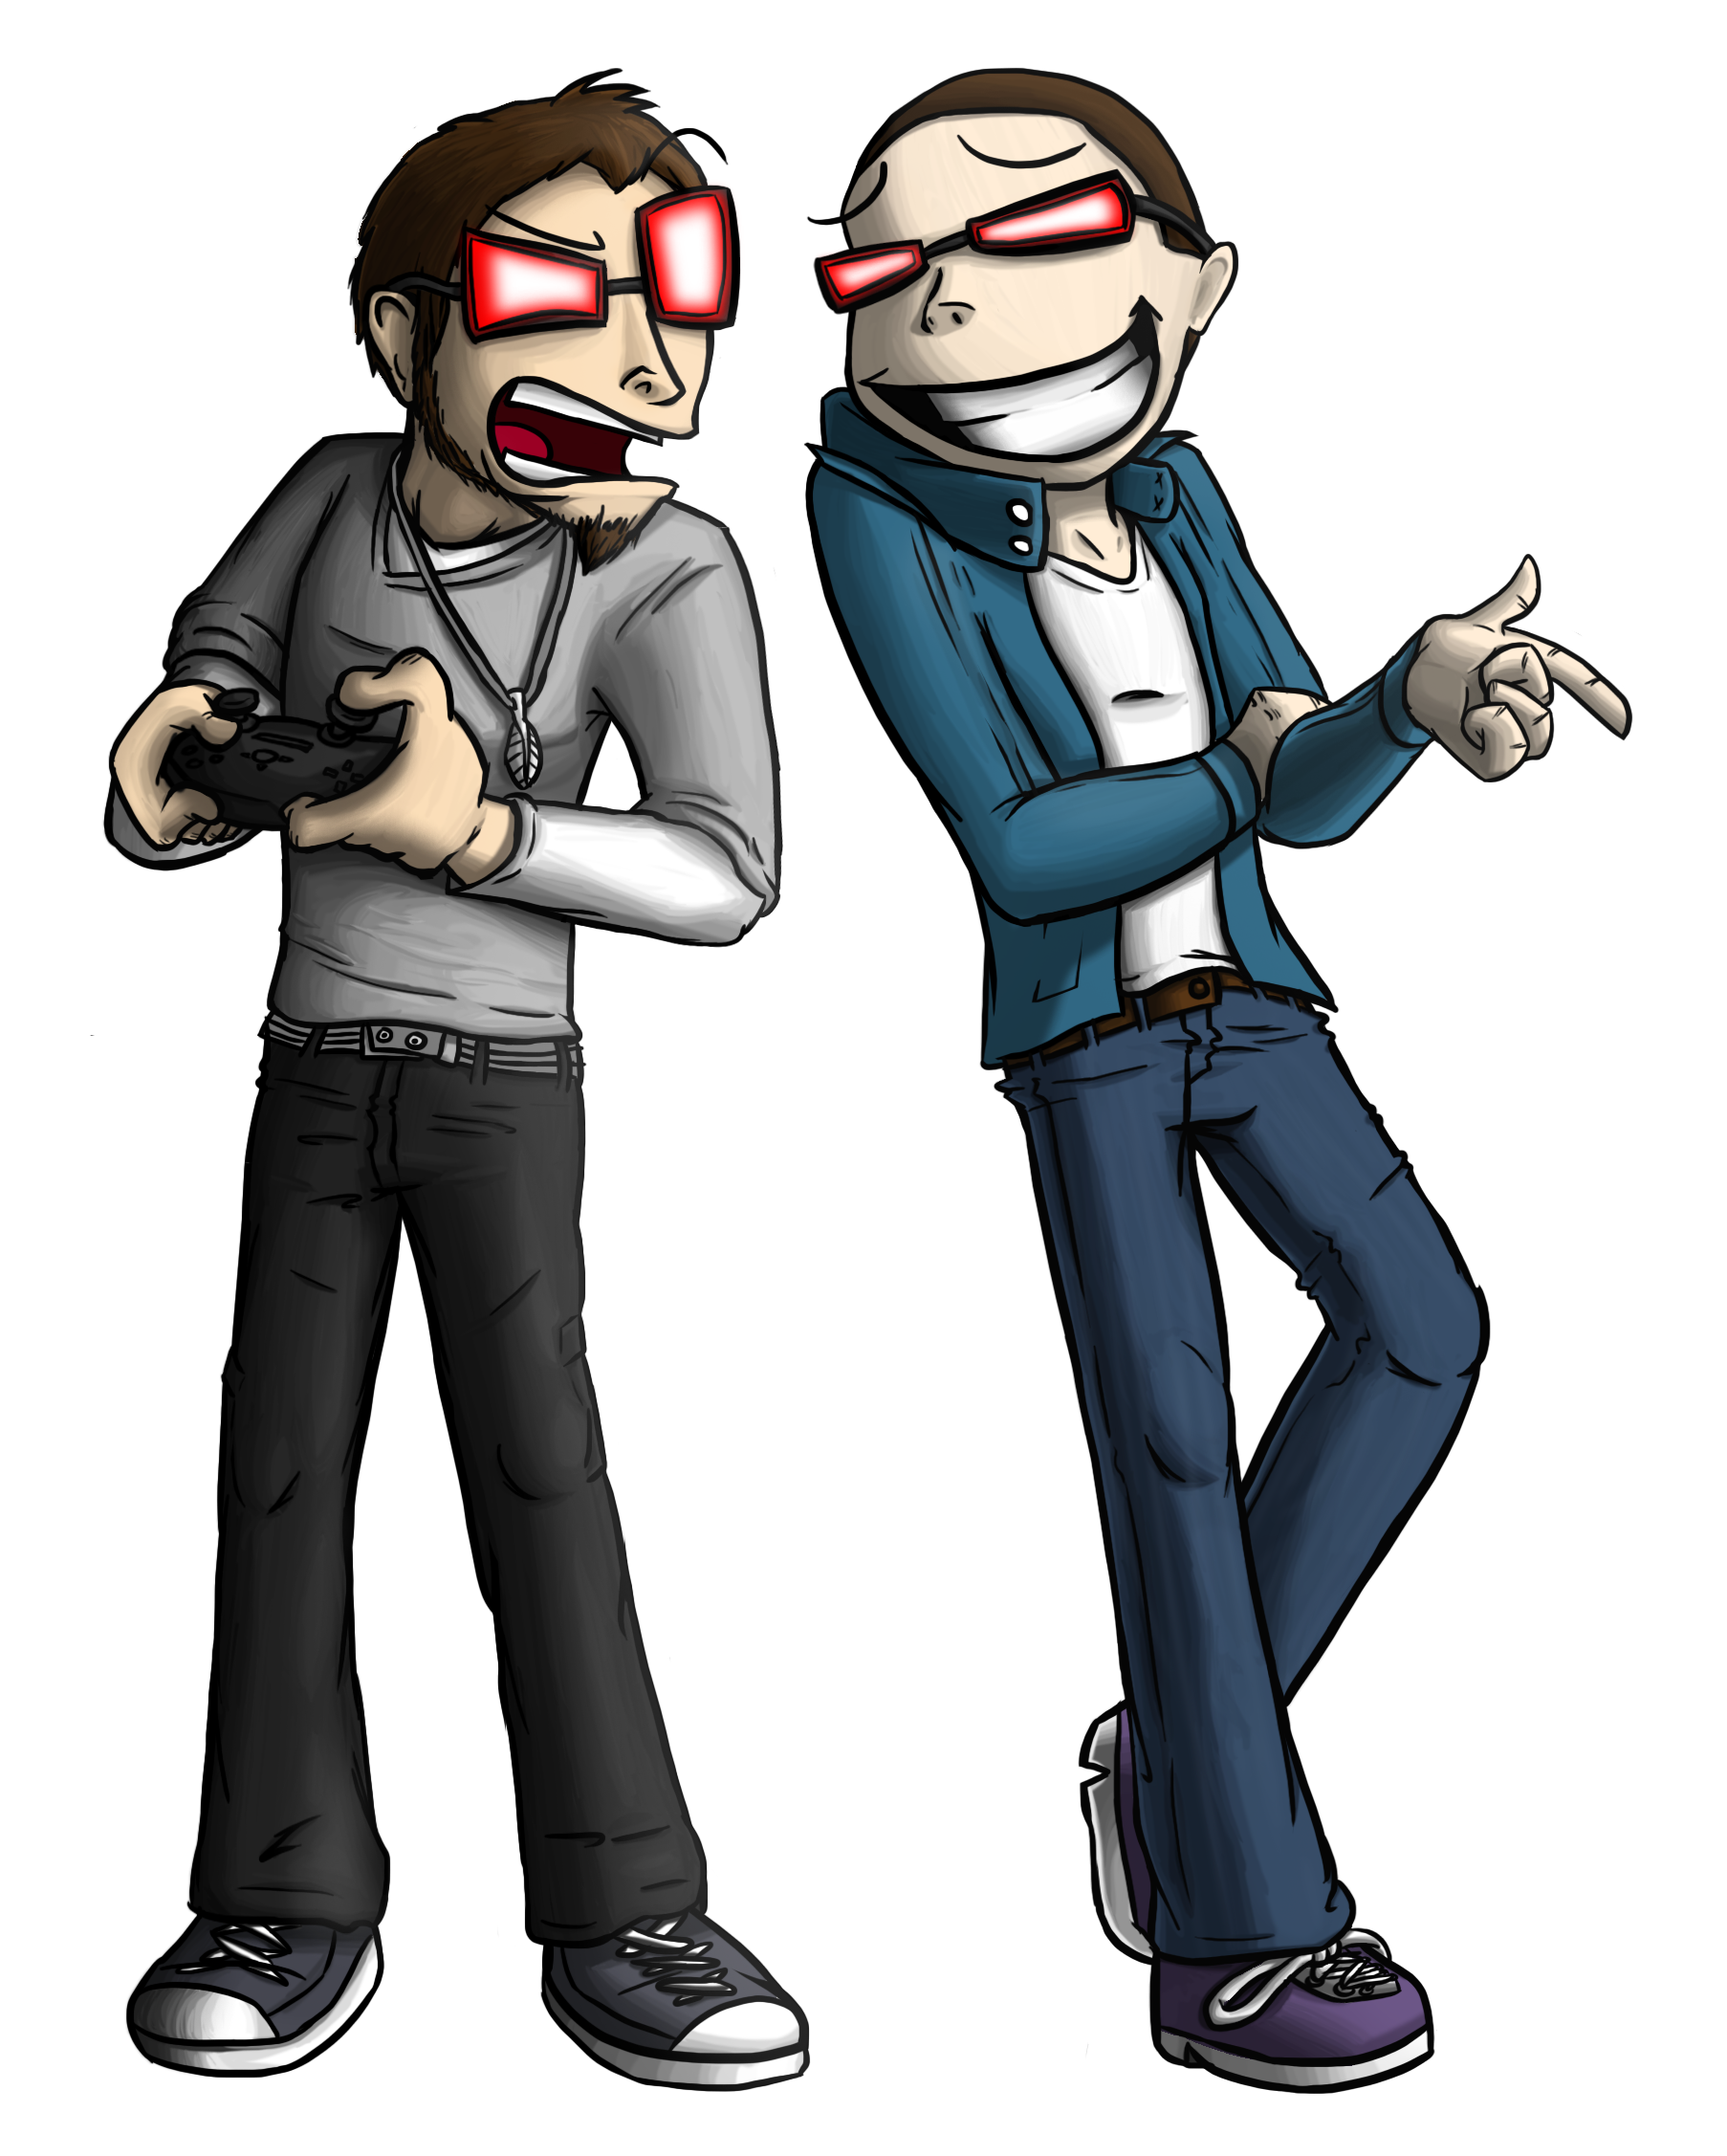 Edwin & SgtTroll